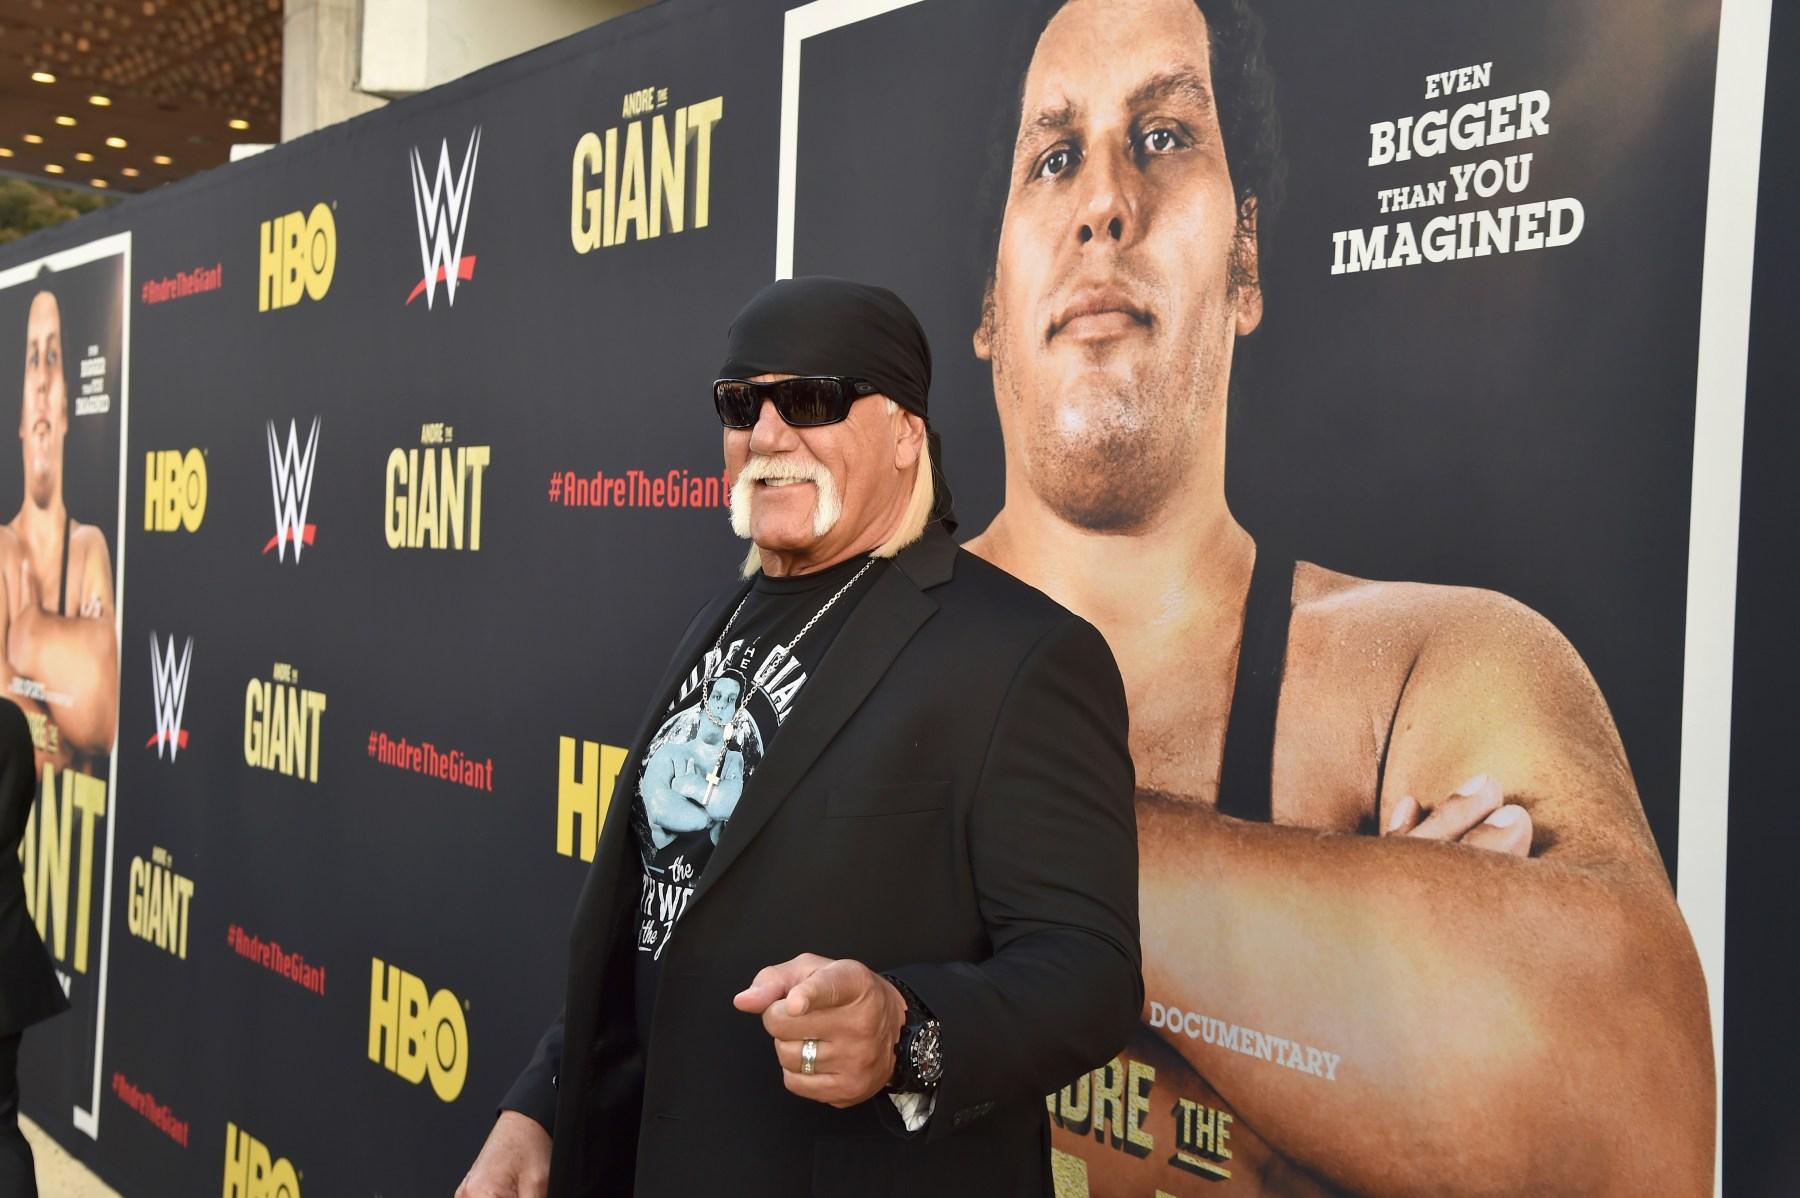 Hogan Andre WrestleMania